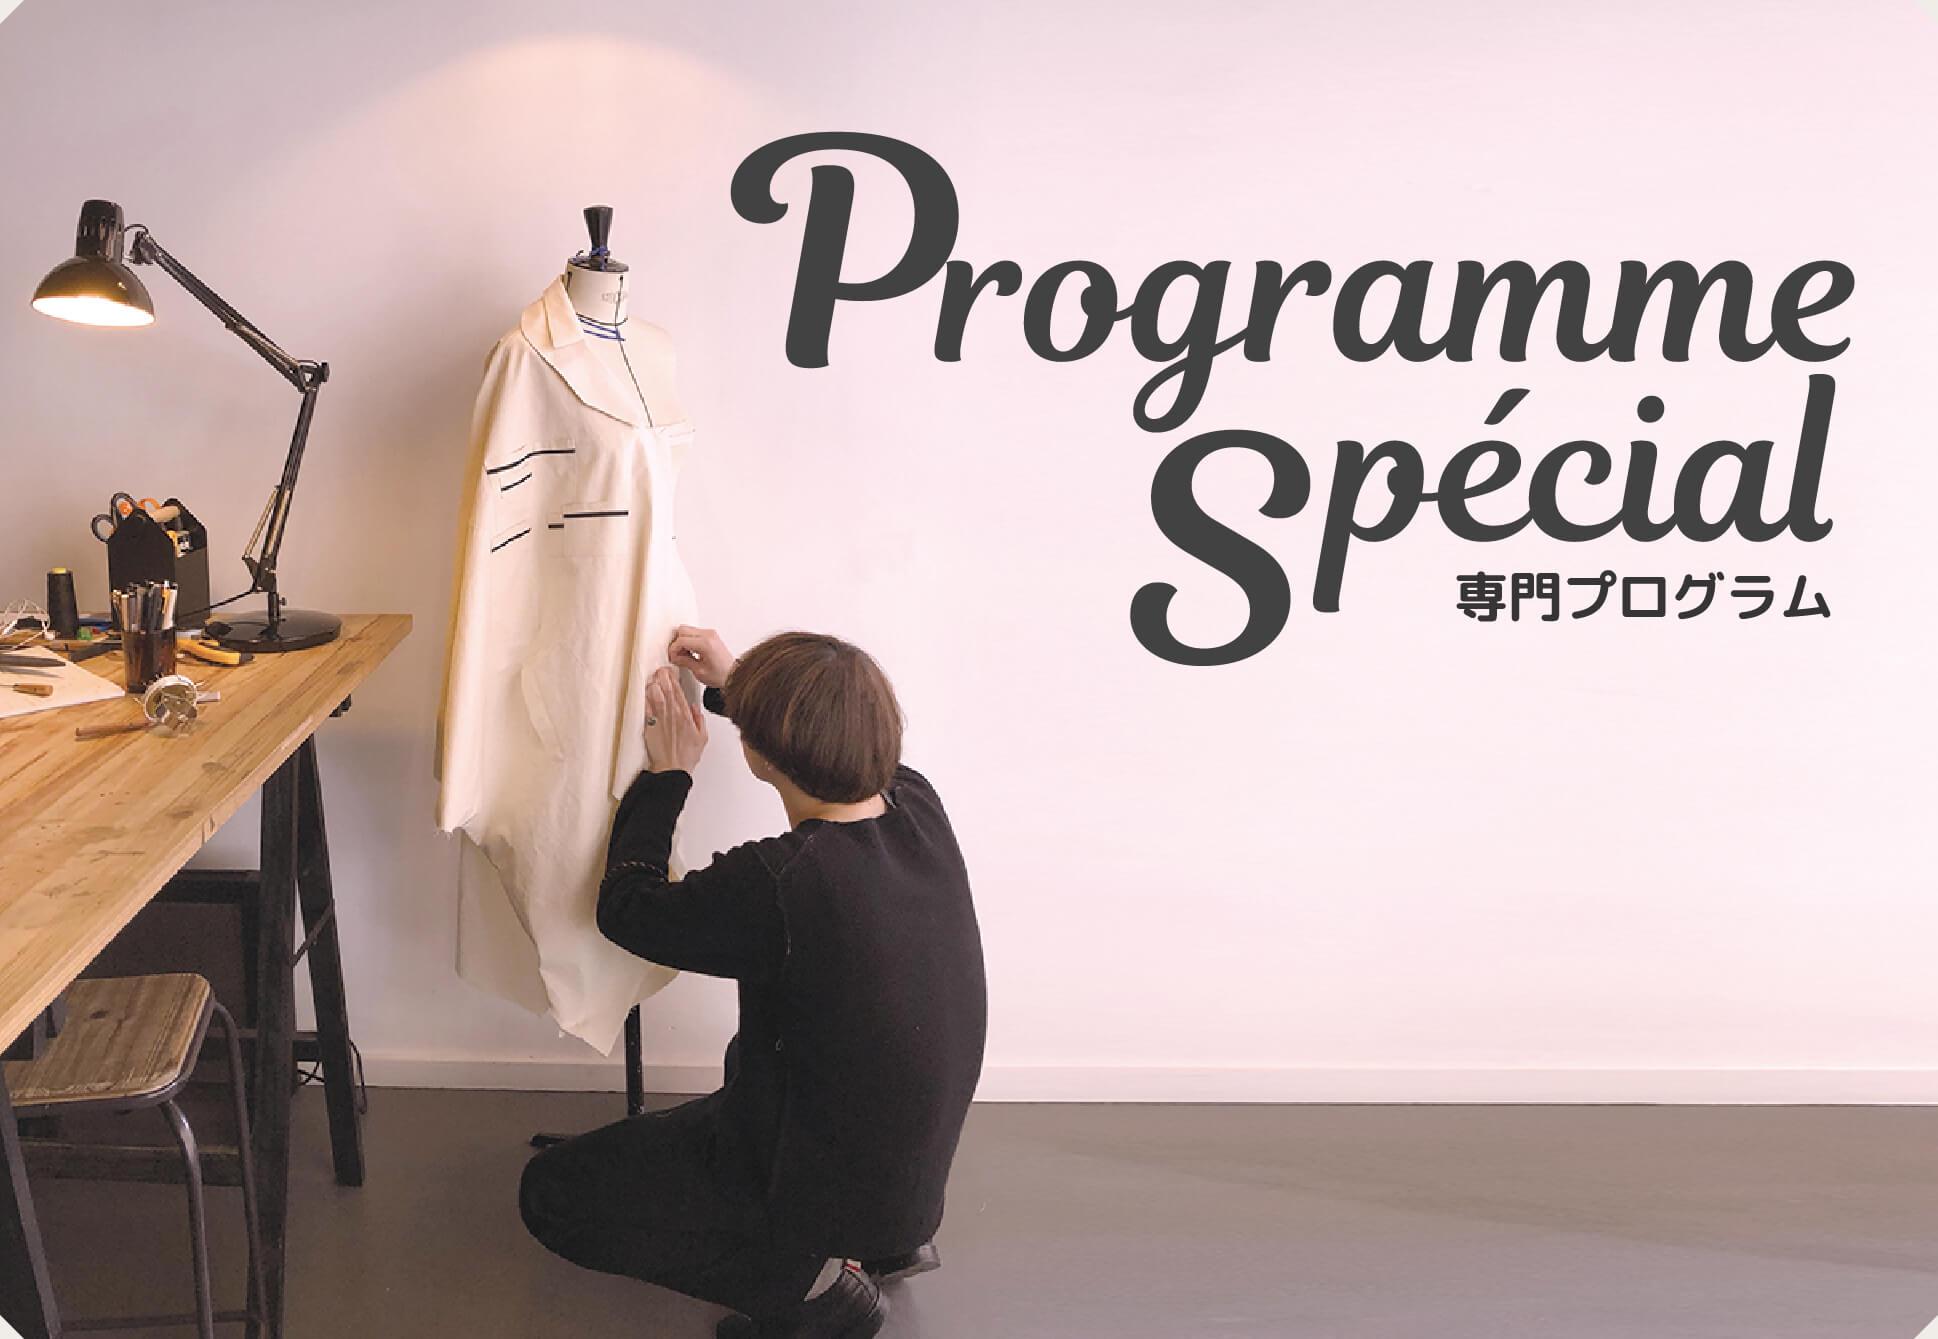 Programme Special 専門プログラム